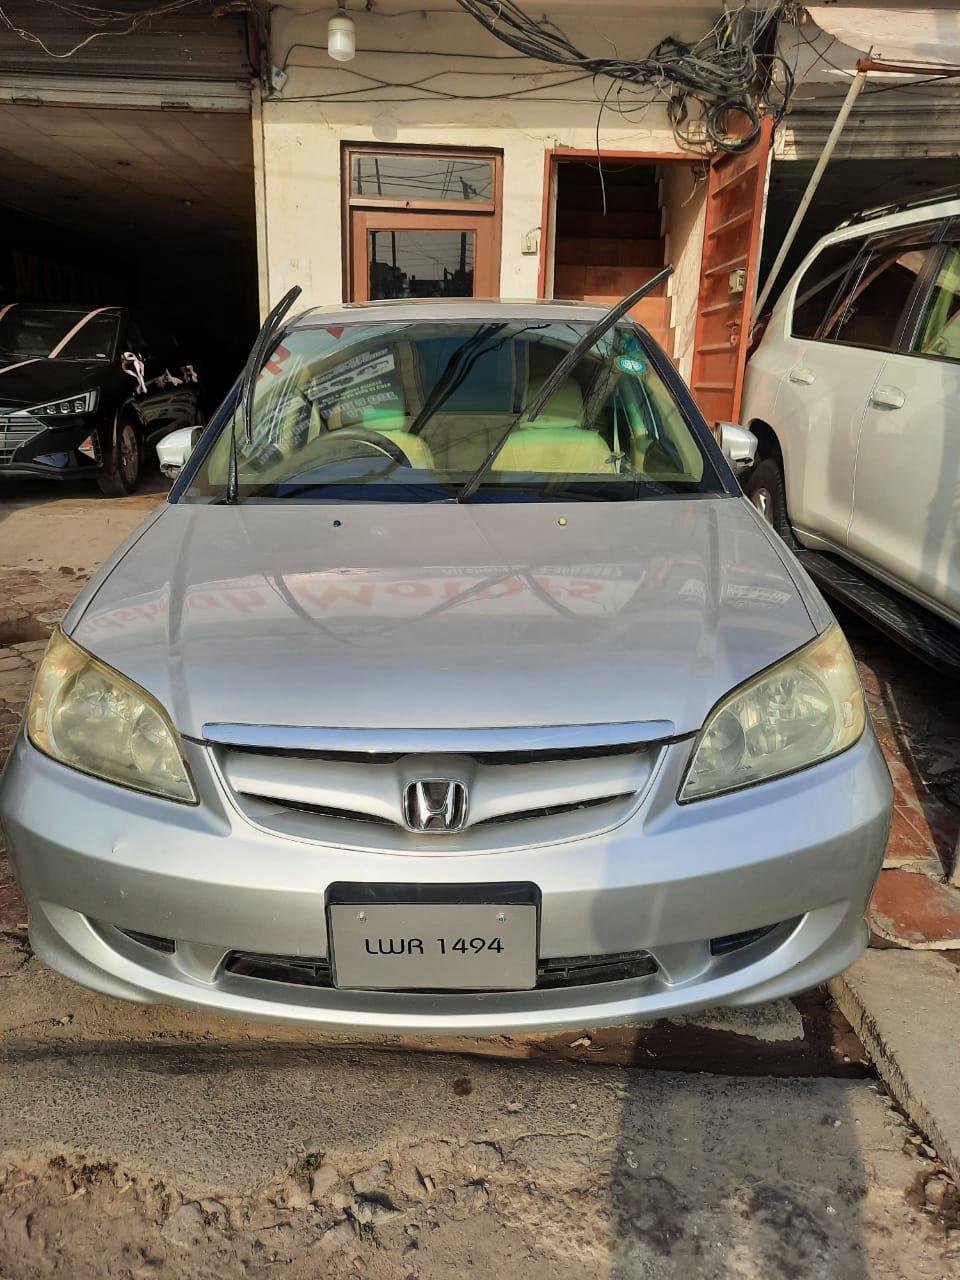 Honda Civic VTi Oriel 1.6